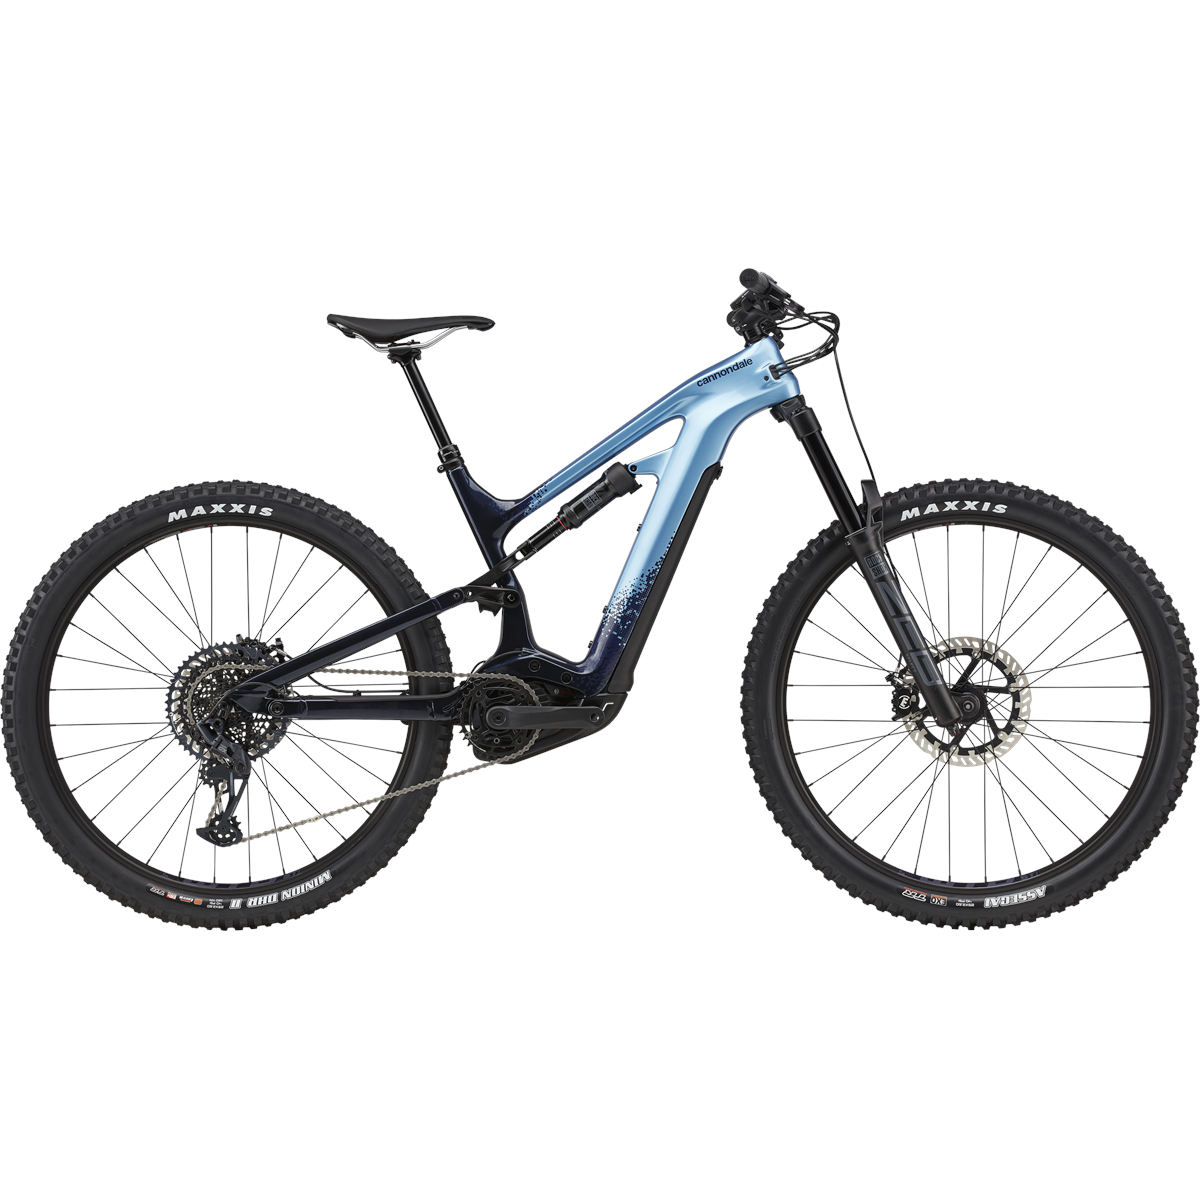 "Cannondale MOTERRA NEO Carbon 2 - 29"" MTB E-Bike - 2021 - Alpine"